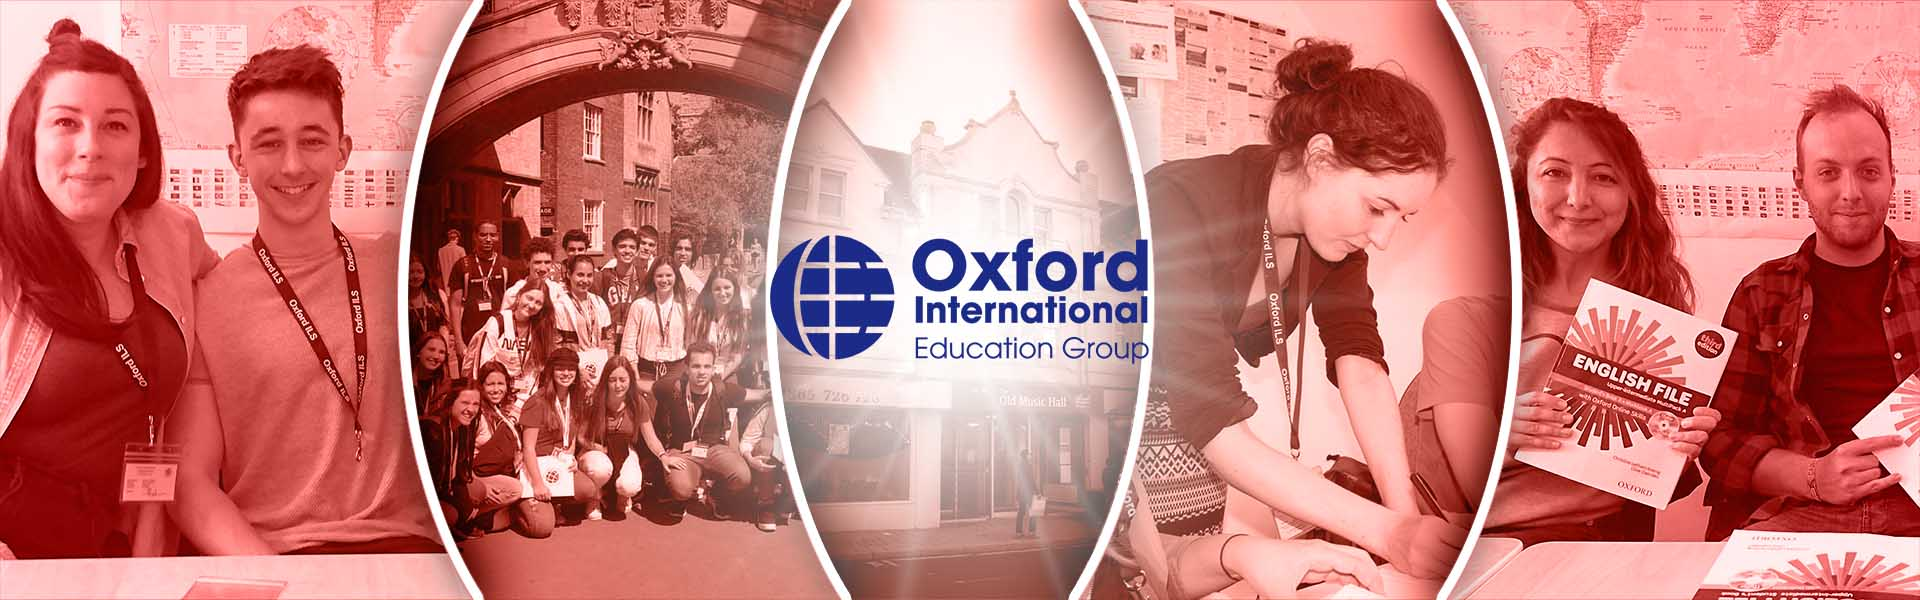 Oxford International Dil Okulu – Oxford